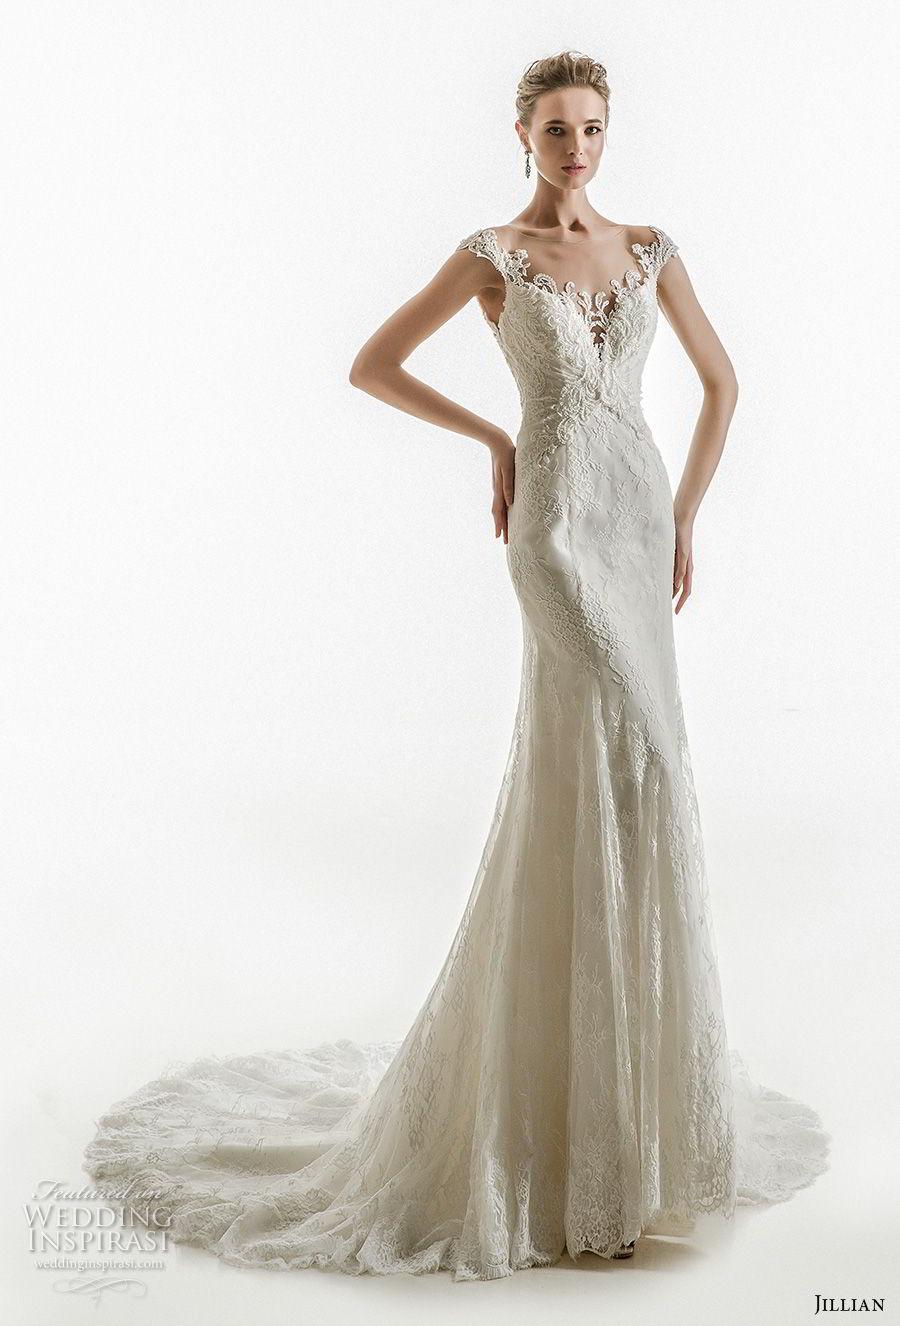 jillian 2018 bridal cap sleeves sweetheart neckline heavily embellished bodice elegant sheath wedding dress sheer button back chapel train (06) mv